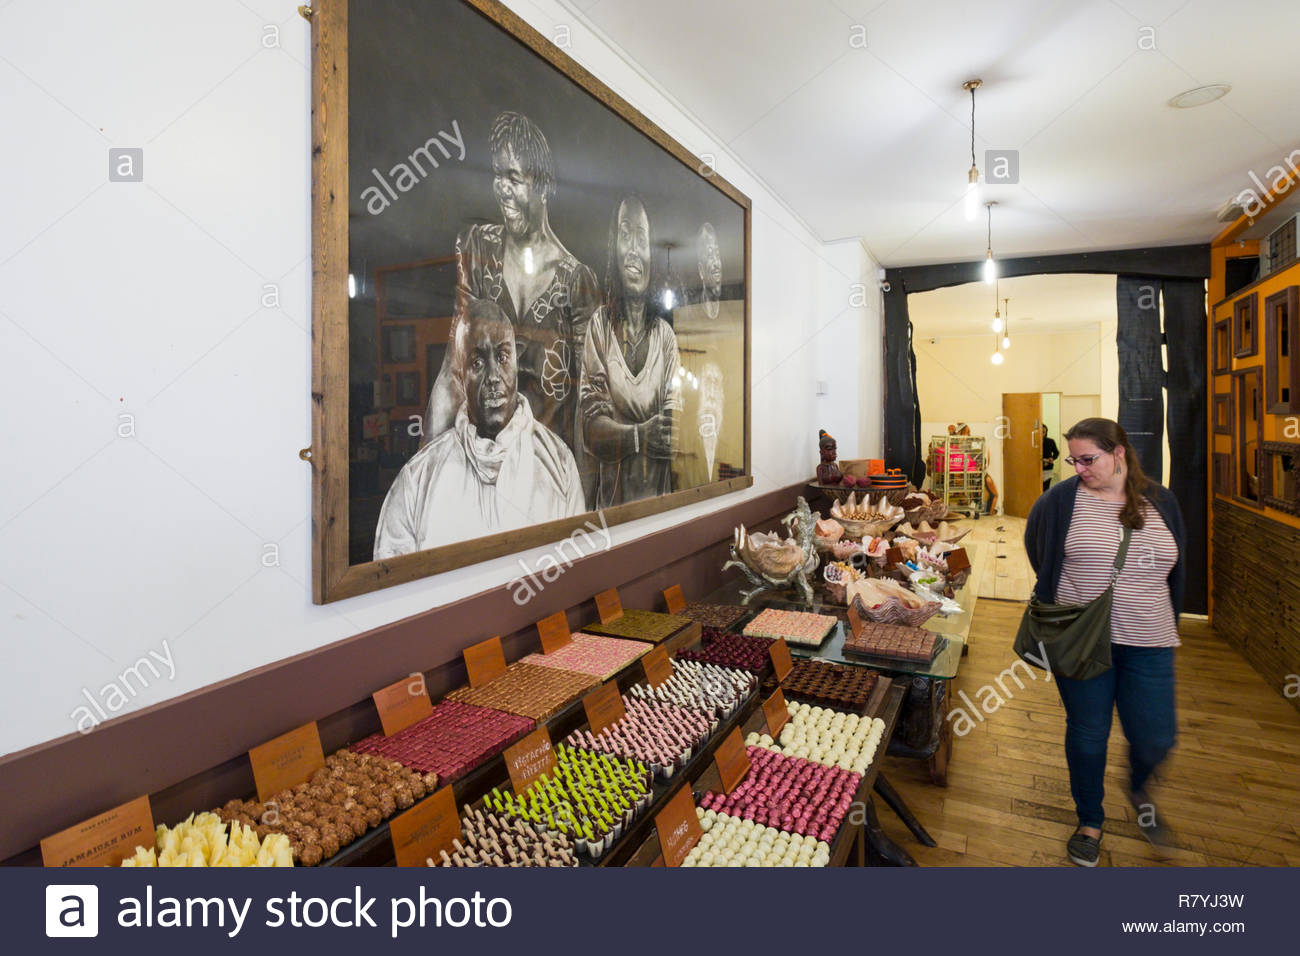 High quality chocolates on display inside Dark Sugars Cocoa House, Brick Lane, Tower Hamlets, London, England, United Kingdom - Stock Image